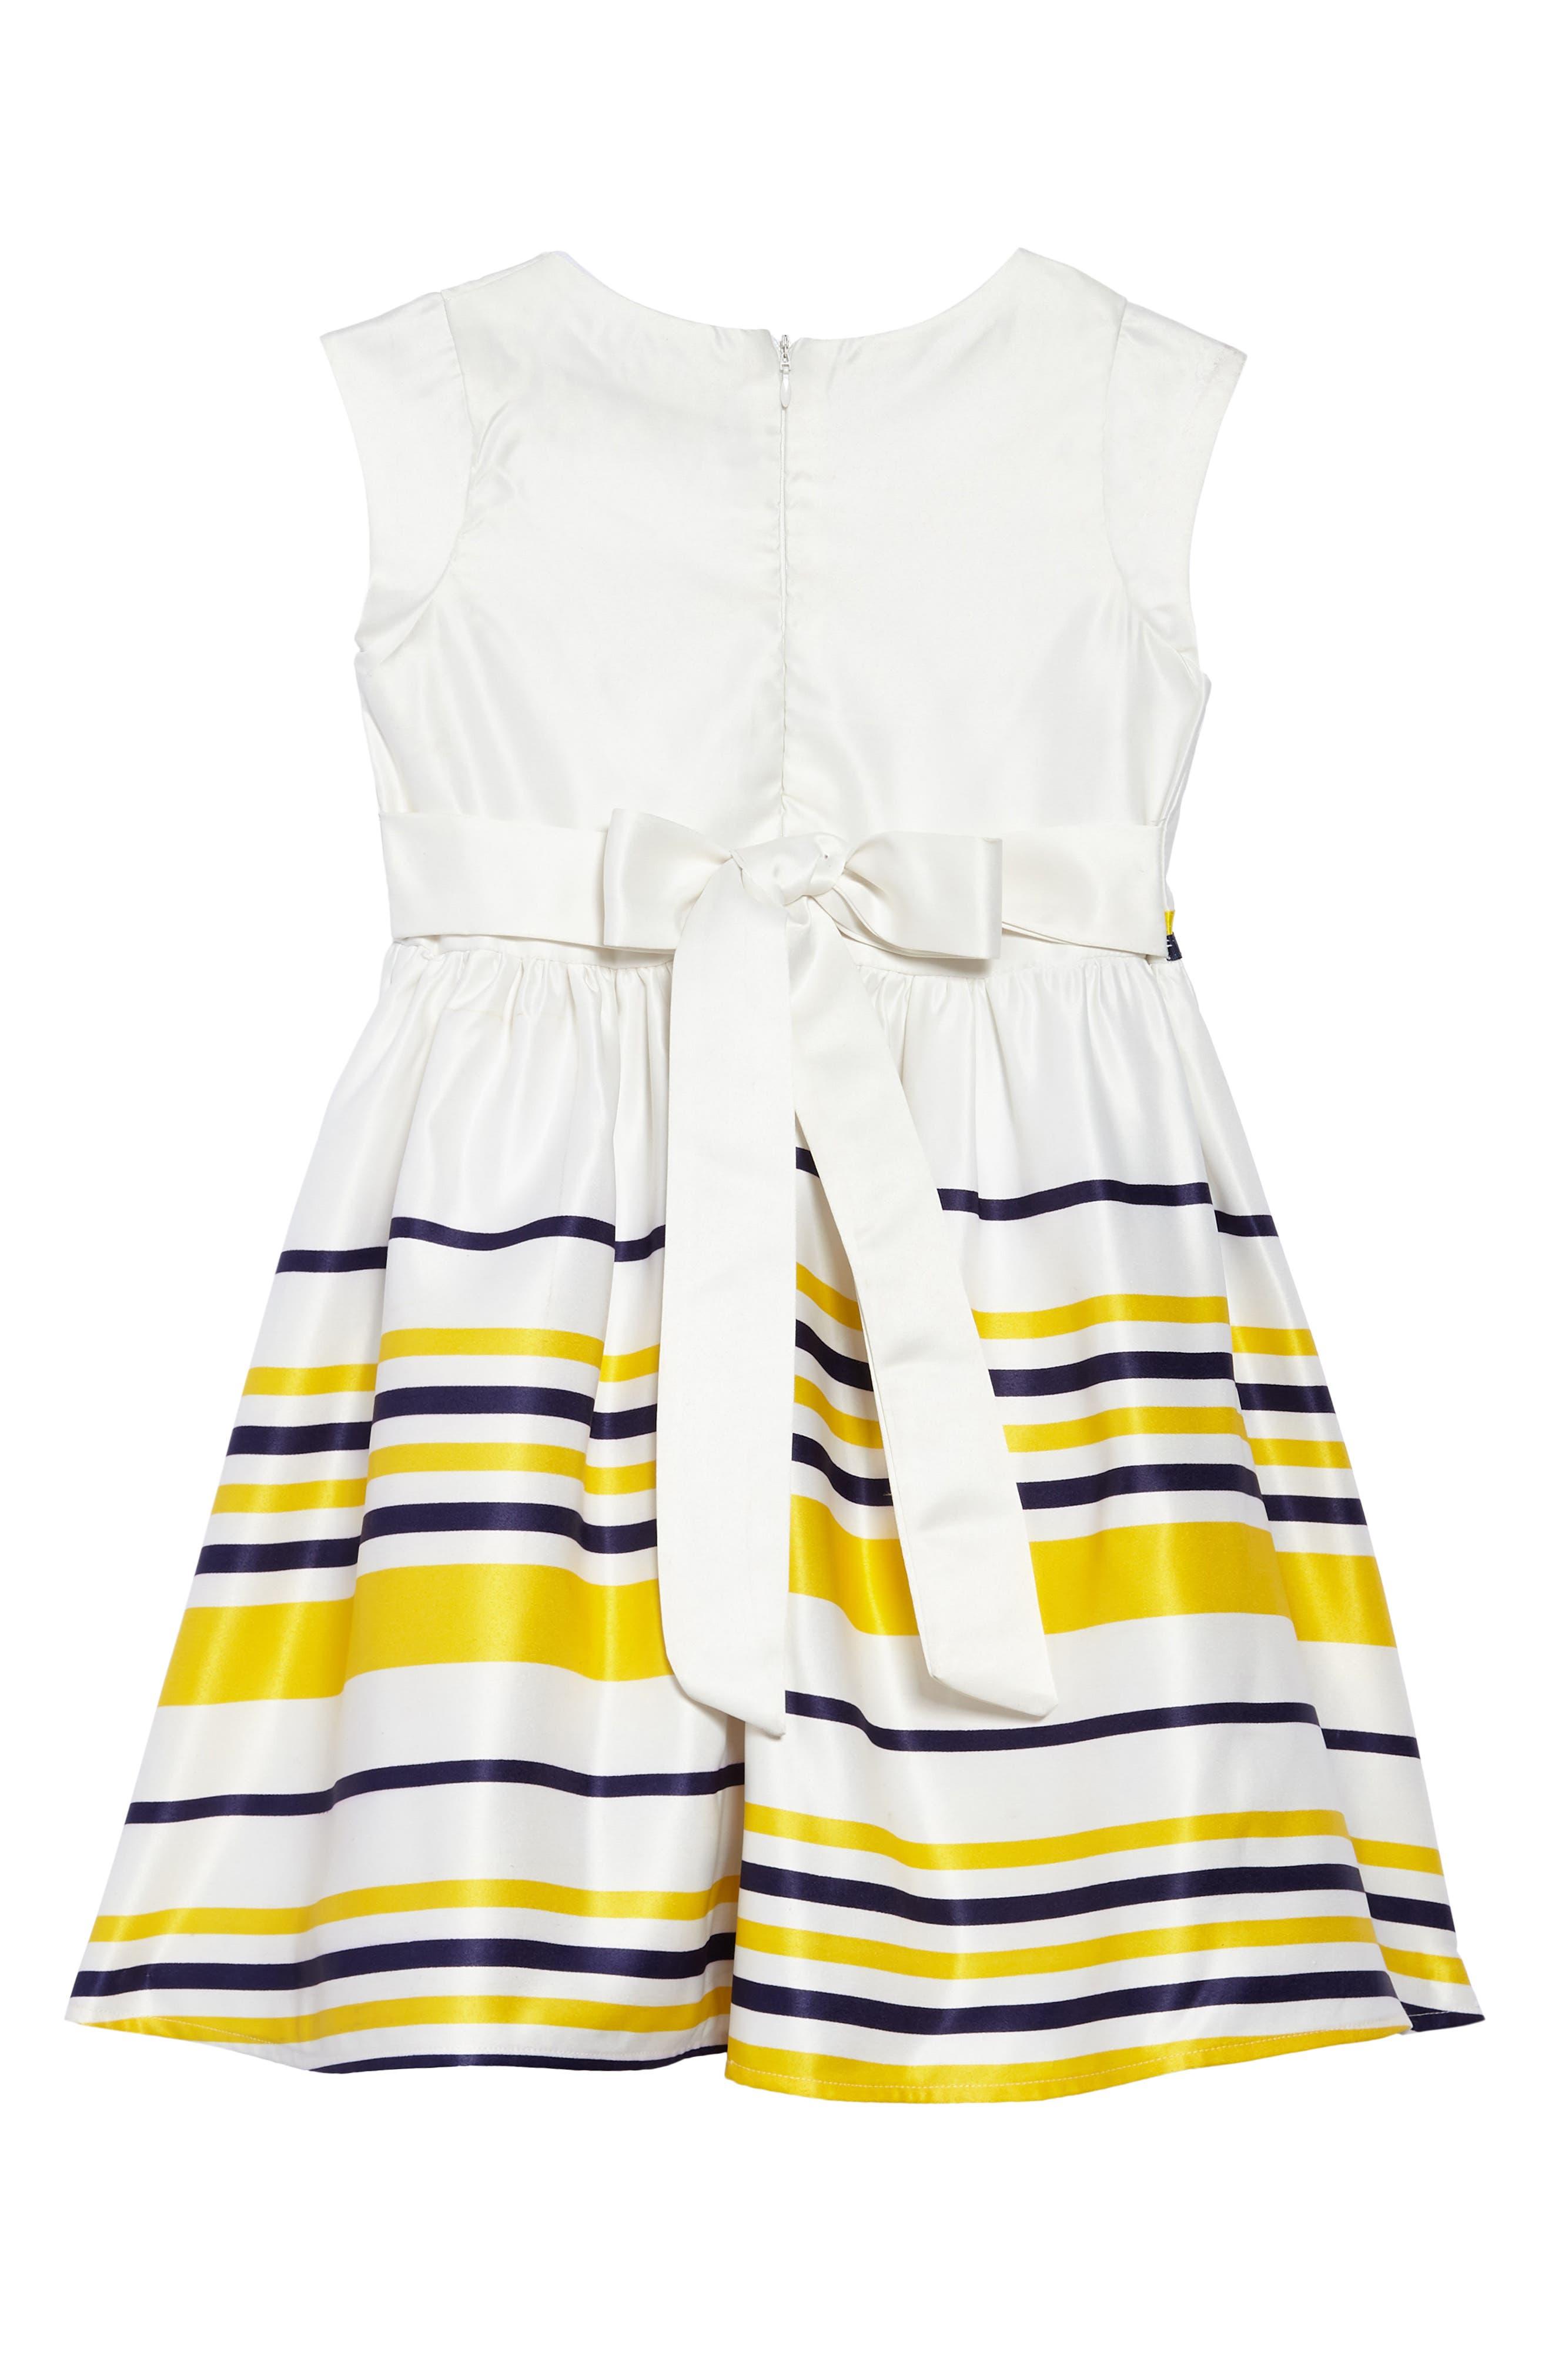 Carly Sleeveless Dress,                             Alternate thumbnail 2, color,                             White/ Multi